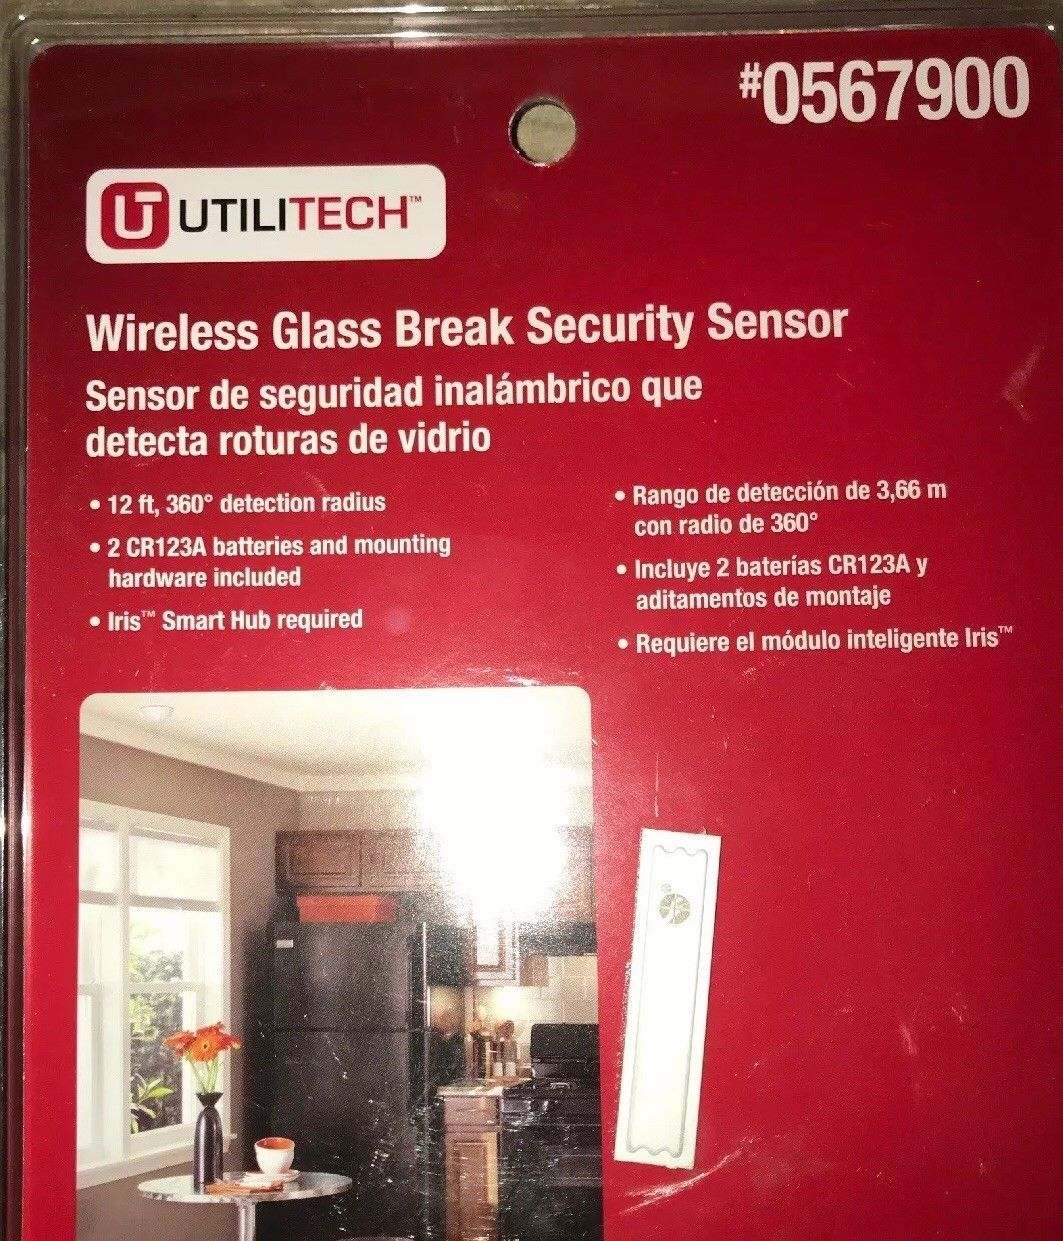 Utilitech Wireless Glass Break Security and 50 similar items